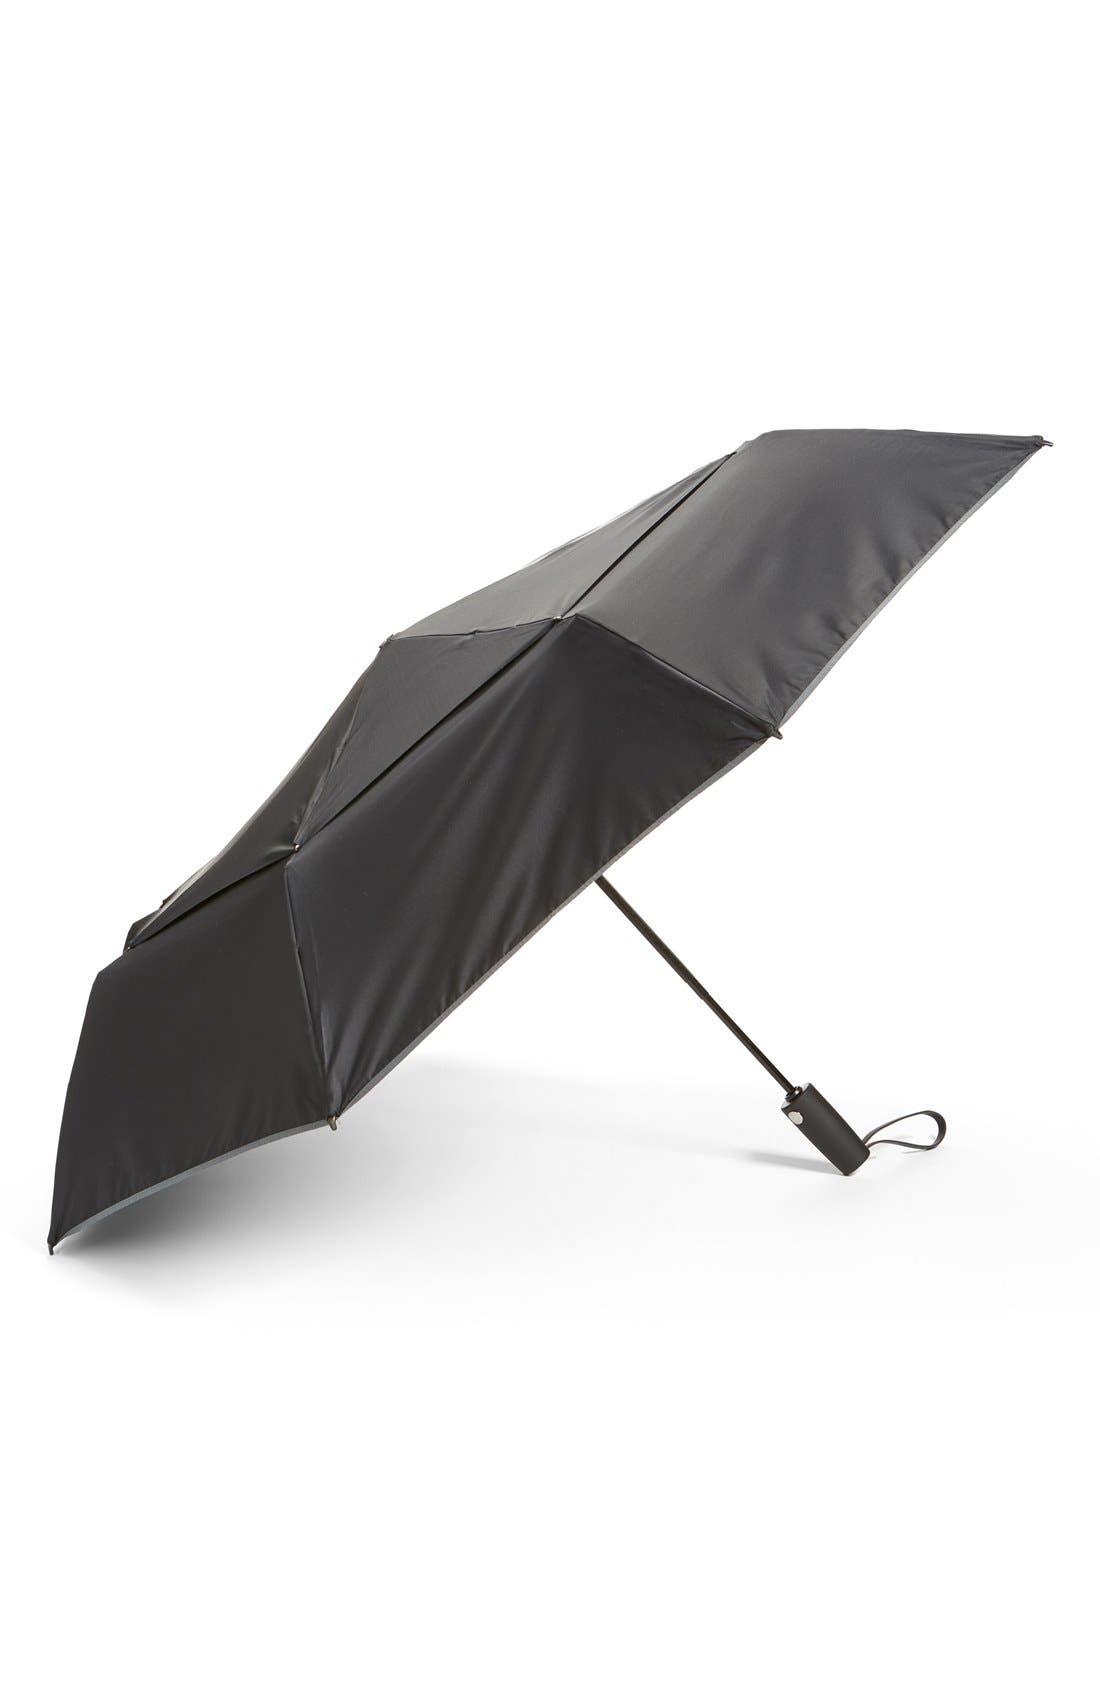 Large Auto Close Umbrella,                         Main,                         color, Black